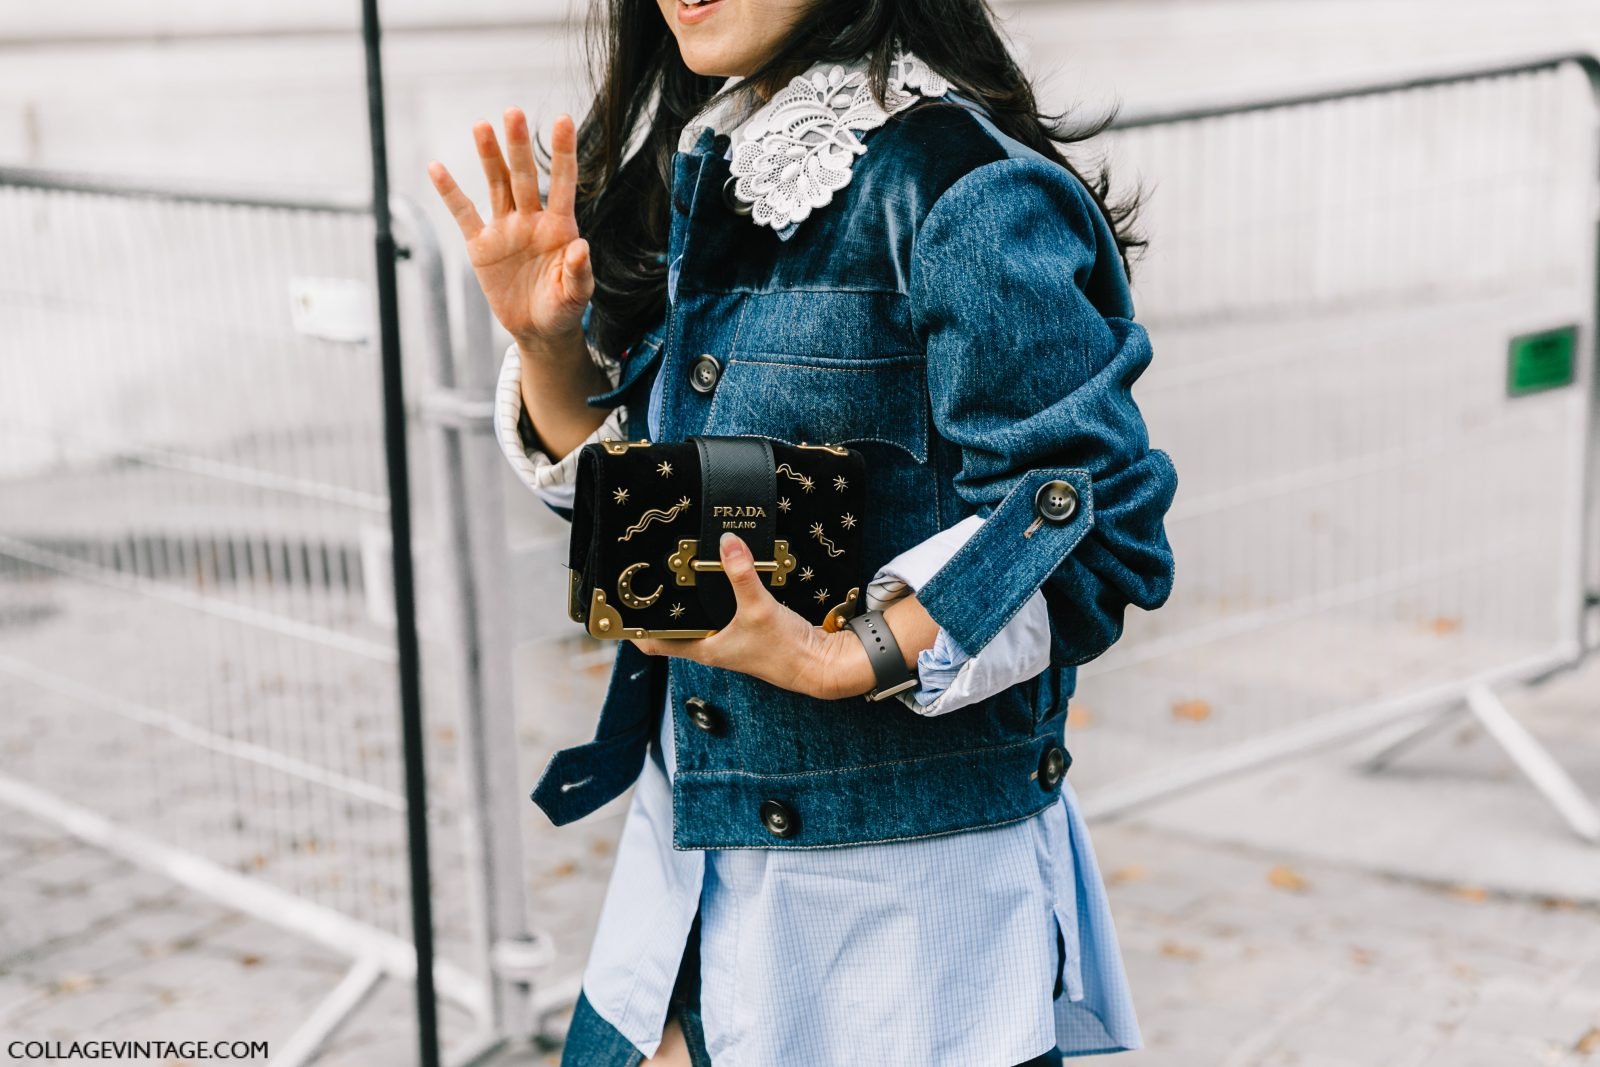 pfw-paris_fashion_week_ss17-street_style-outfits-collage_vintage-chloe-carven-balmain-barbara_bui